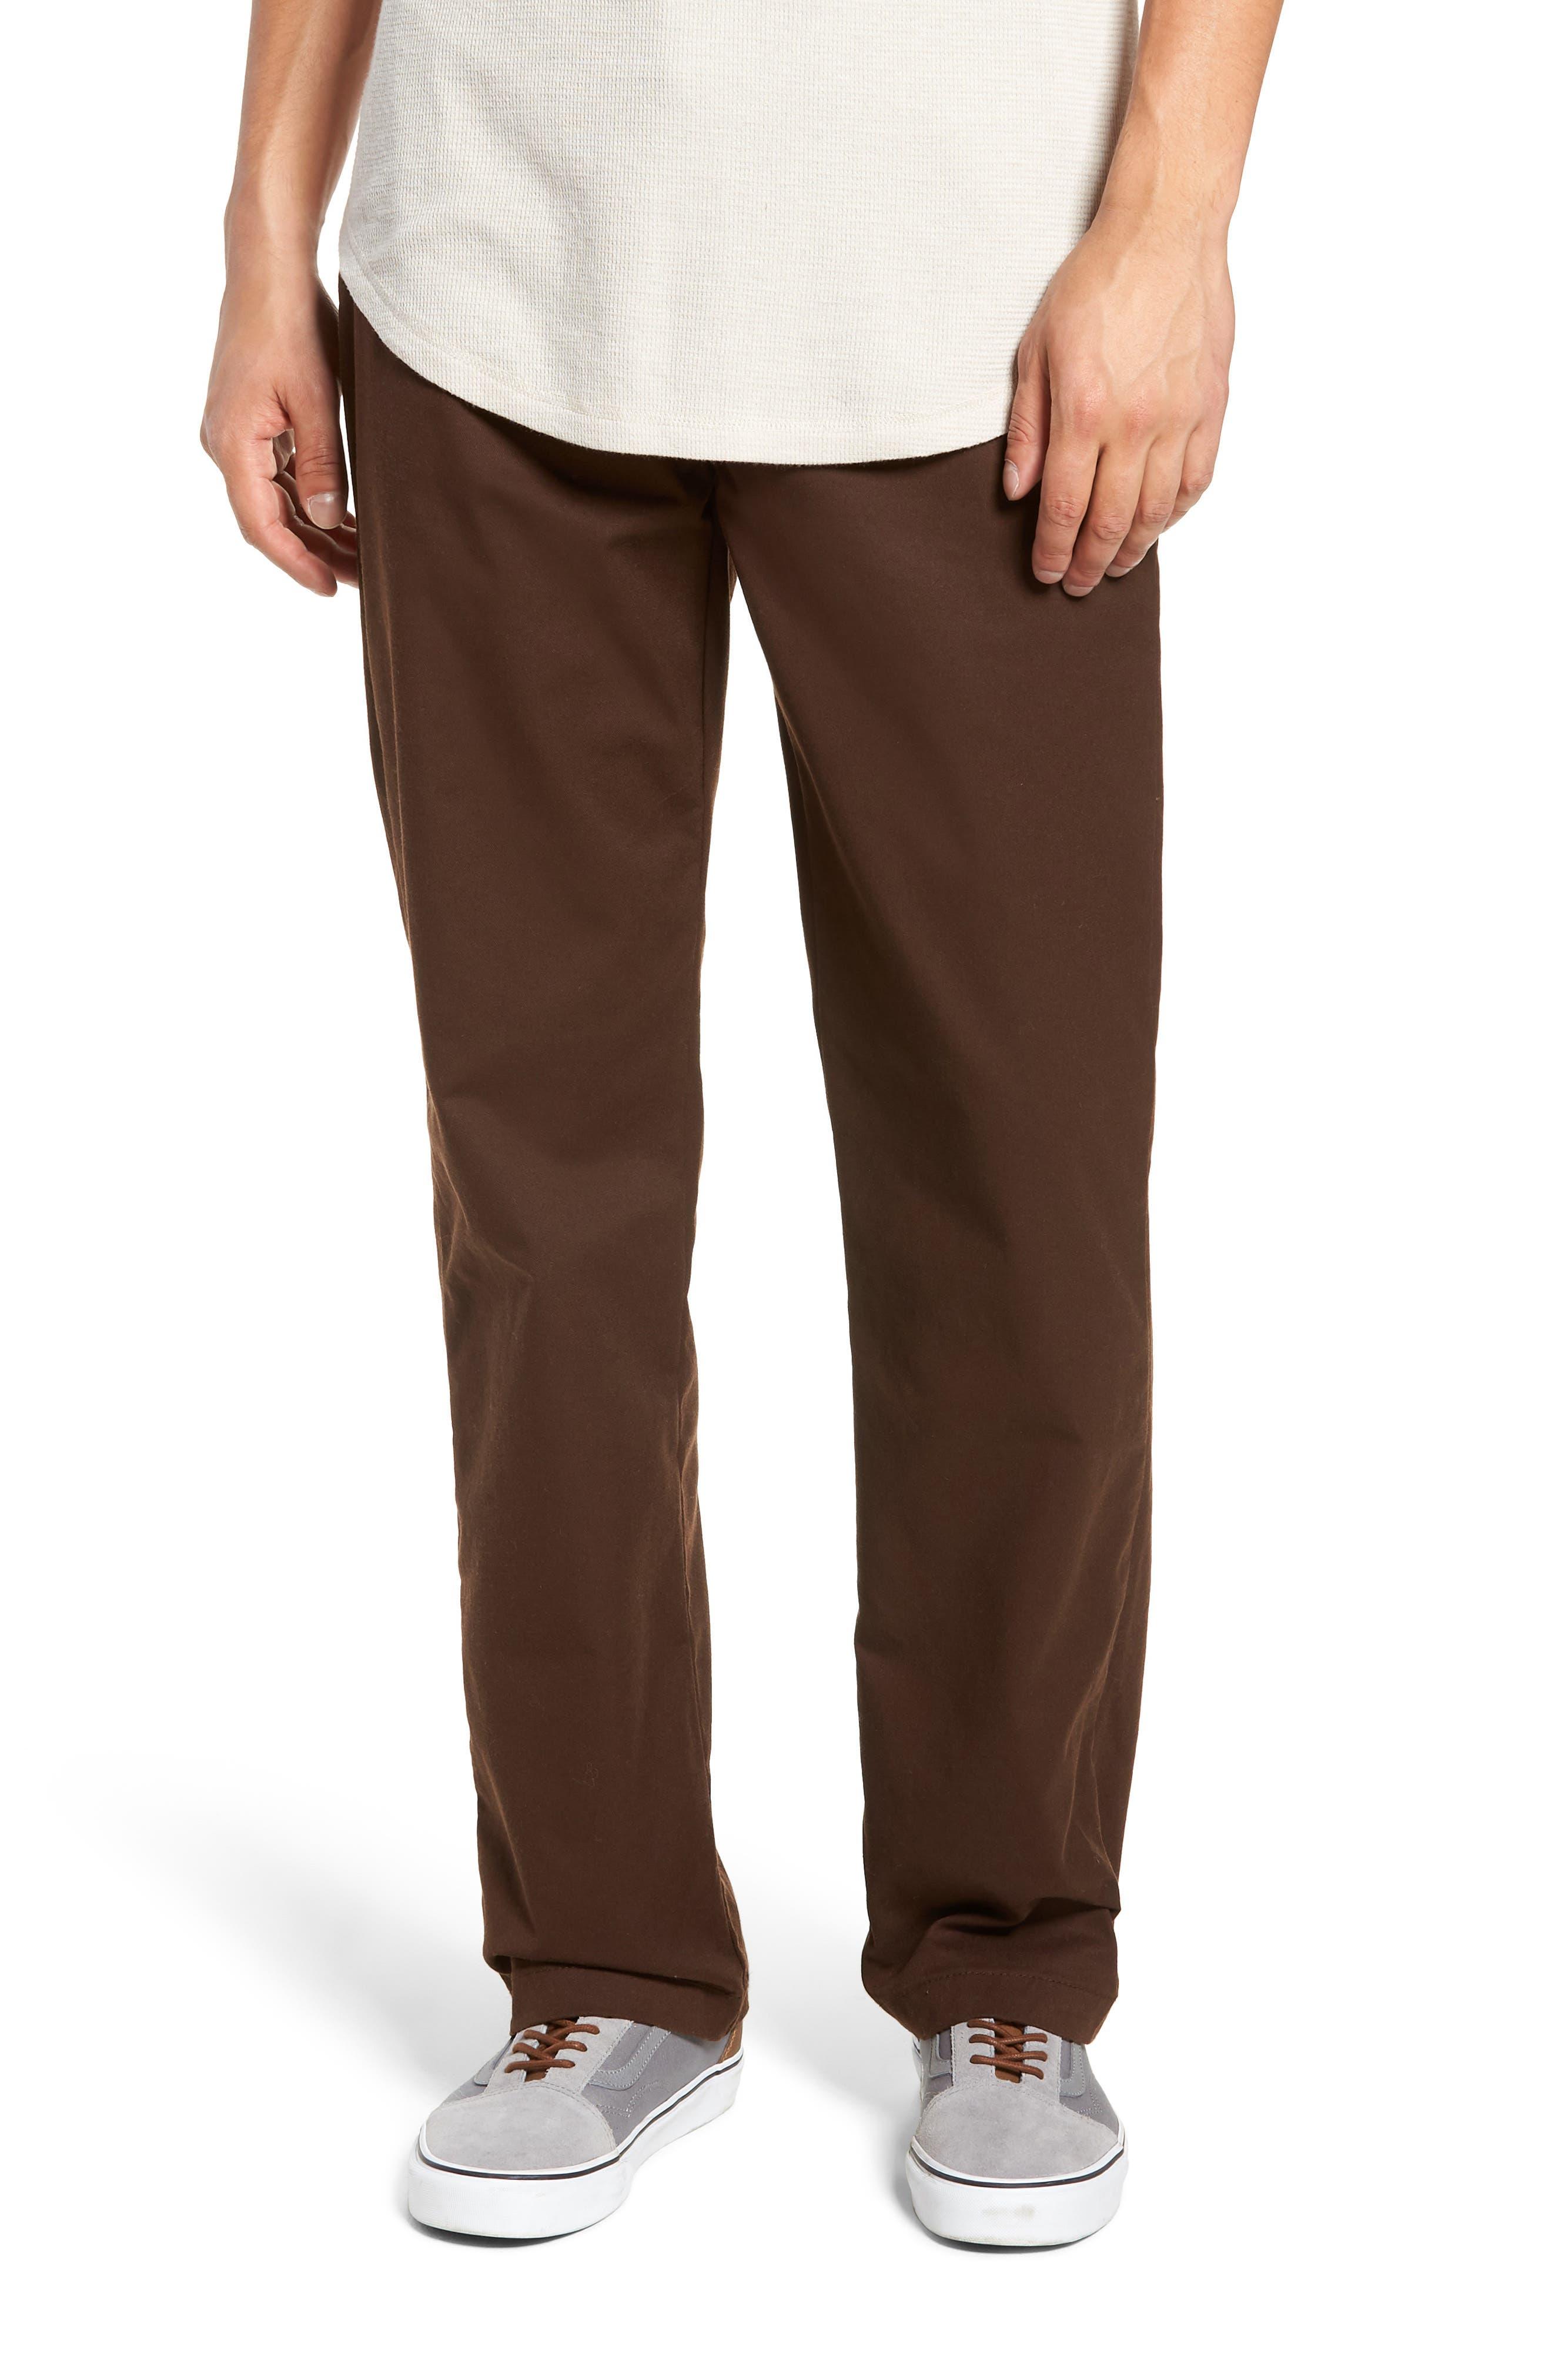 Authentic Chino Pro Pants,                         Main,                         color, DEMITASSE